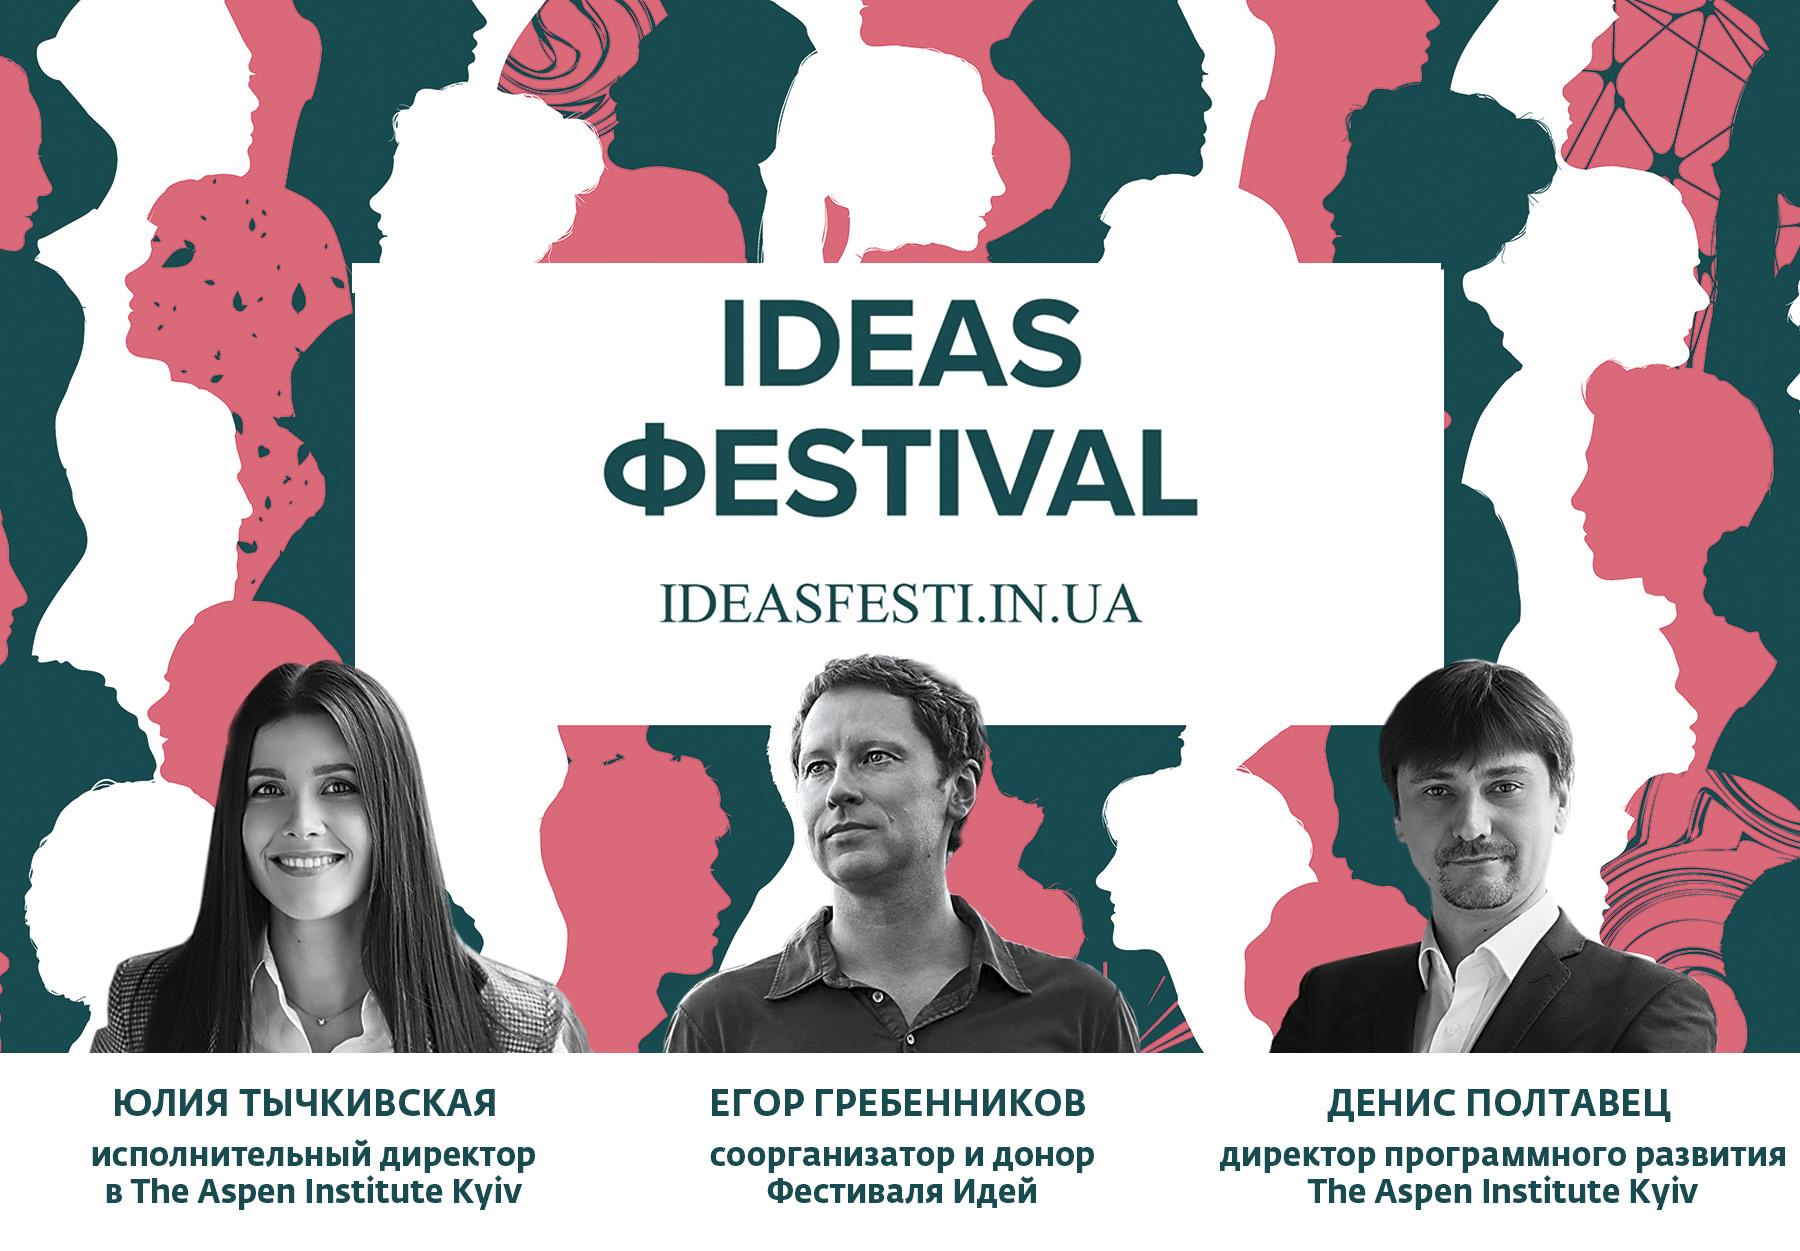 ФЕСТИВАЛЬ ИДЕЙ: Liberal Arts and Education от Aspen Institute Kyiv и Impact hub Odessa